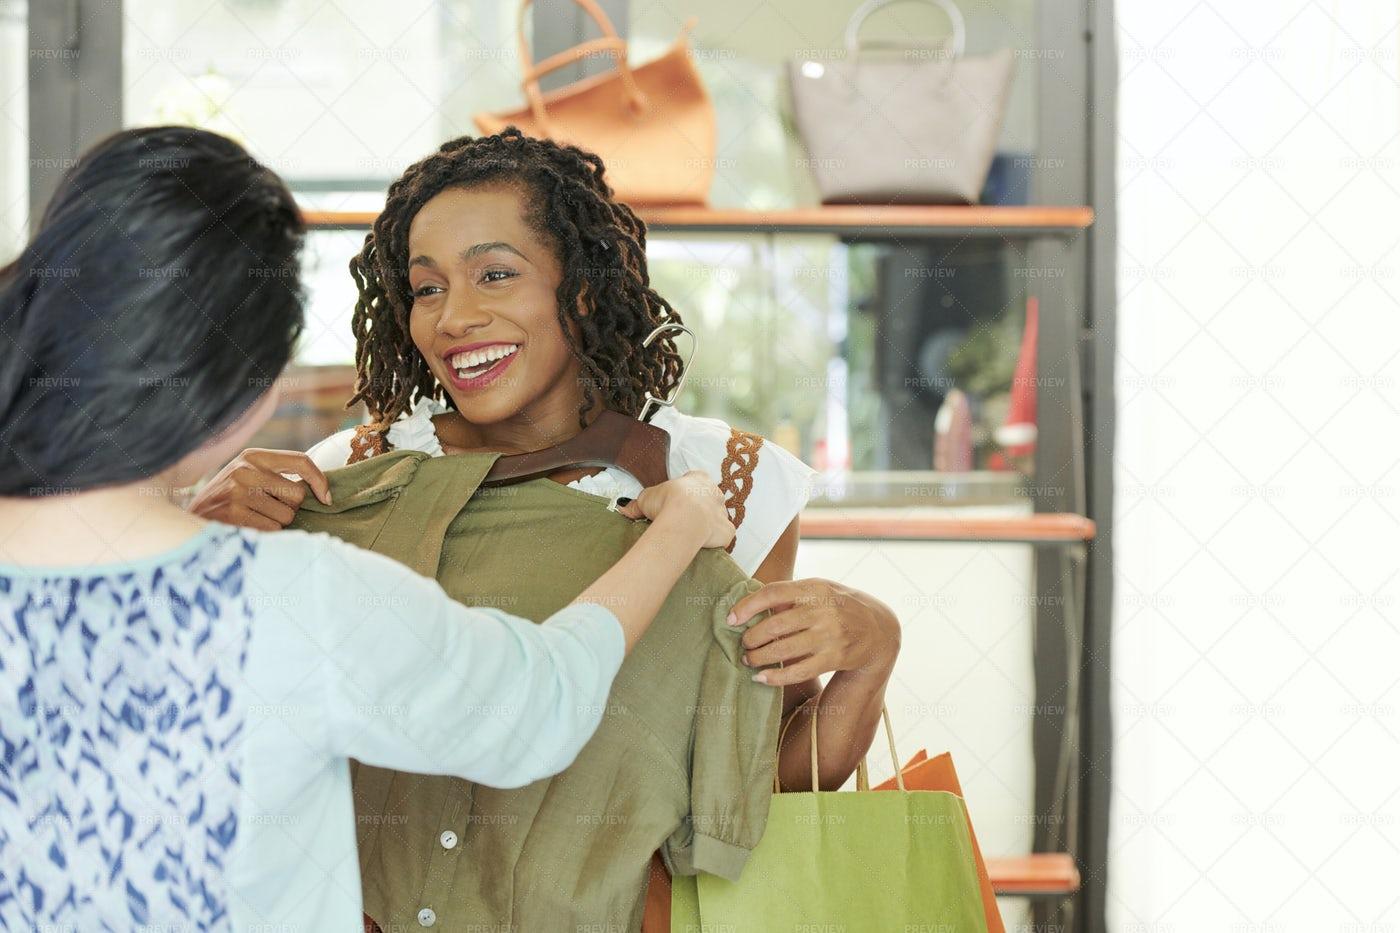 Friends Choosing Dress At Store: Stock Photos